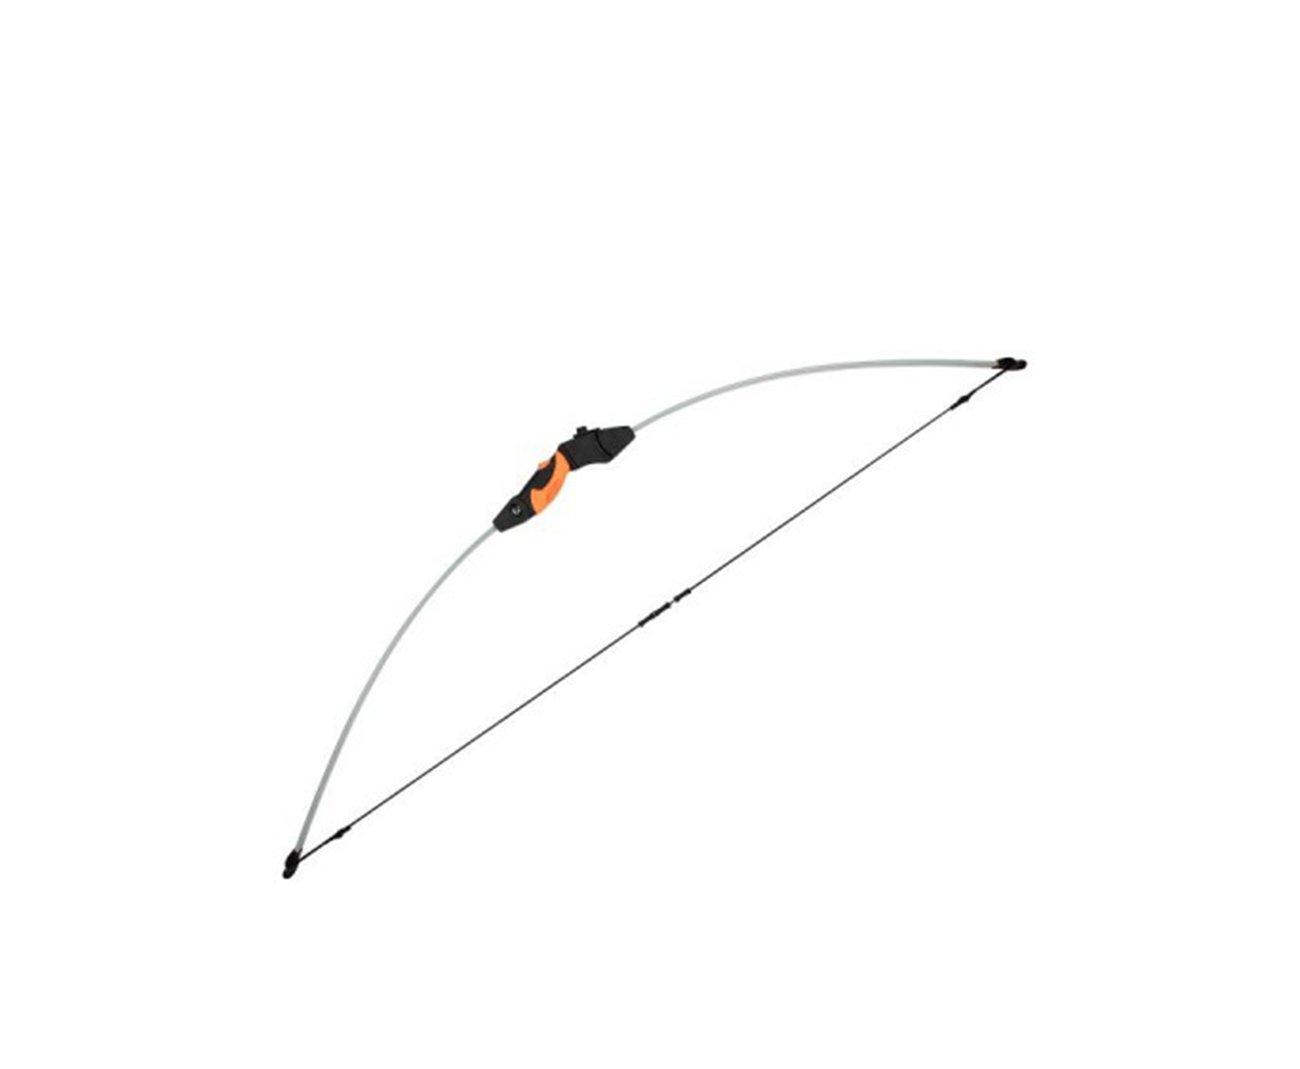 "Arco Recurvo Ulsioux 15 Lb 2 Flechas De 20"" - Preto - Barnett"